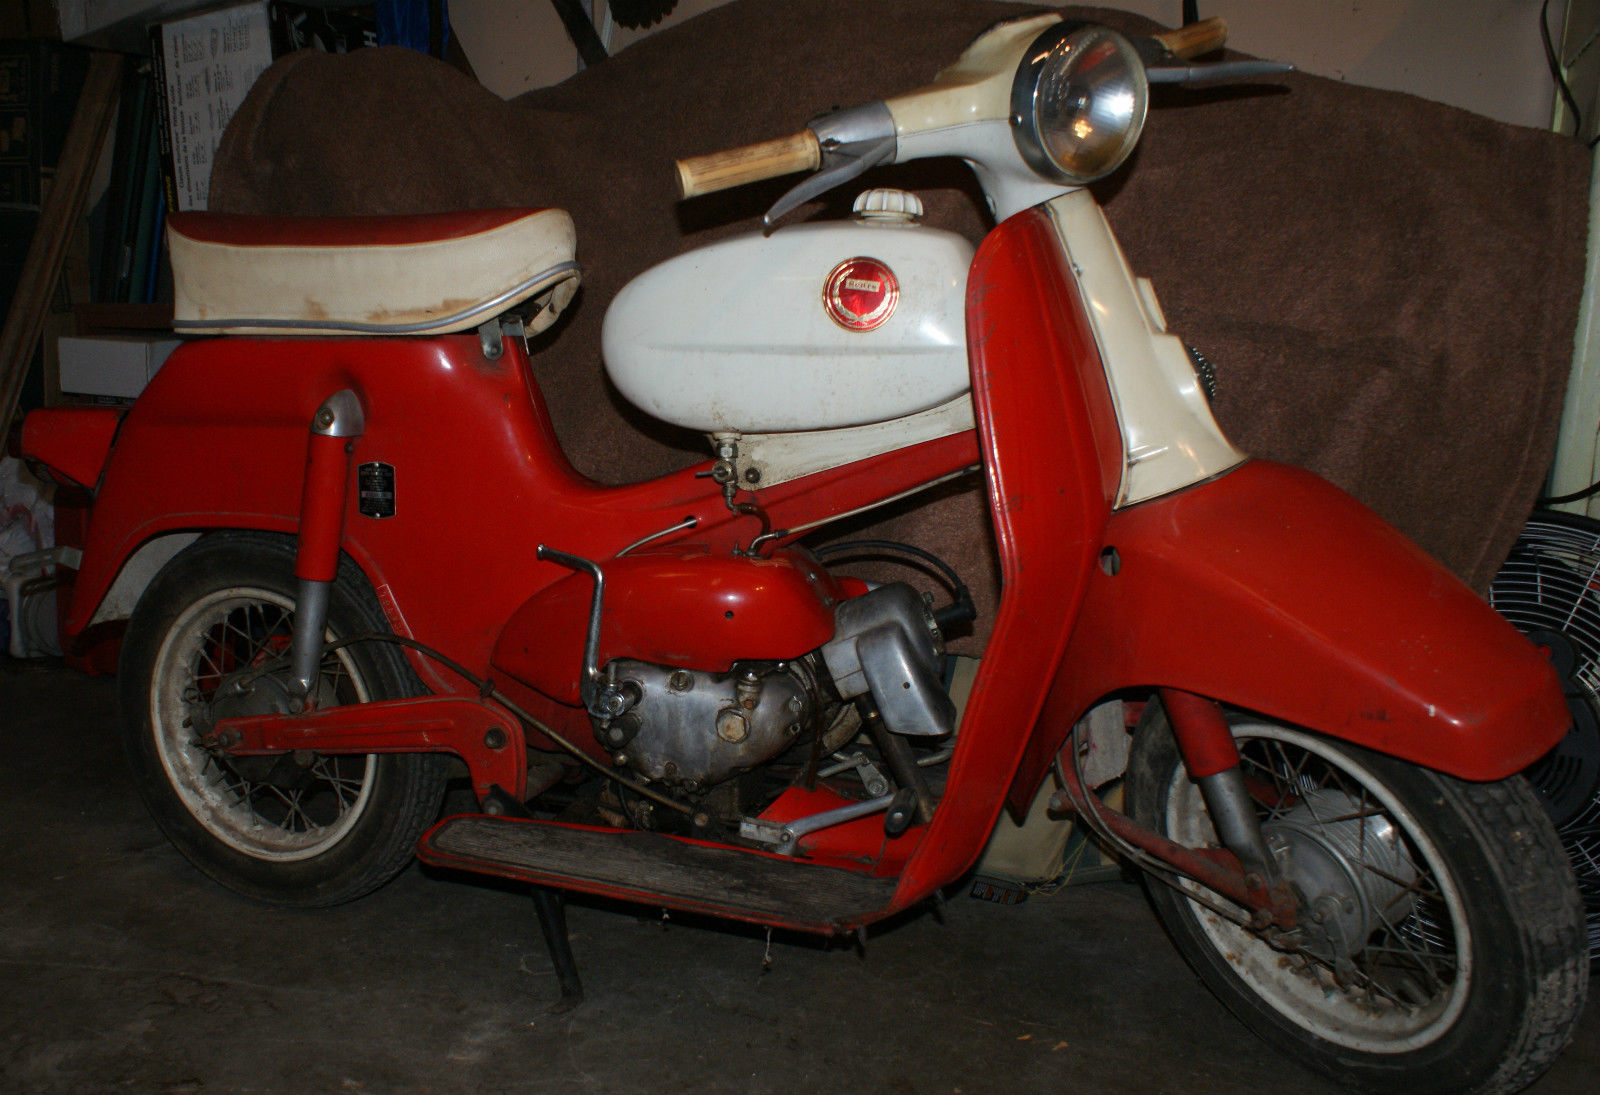 1966 Sears Allstate Motor Scooter Built By Steyr Daimler